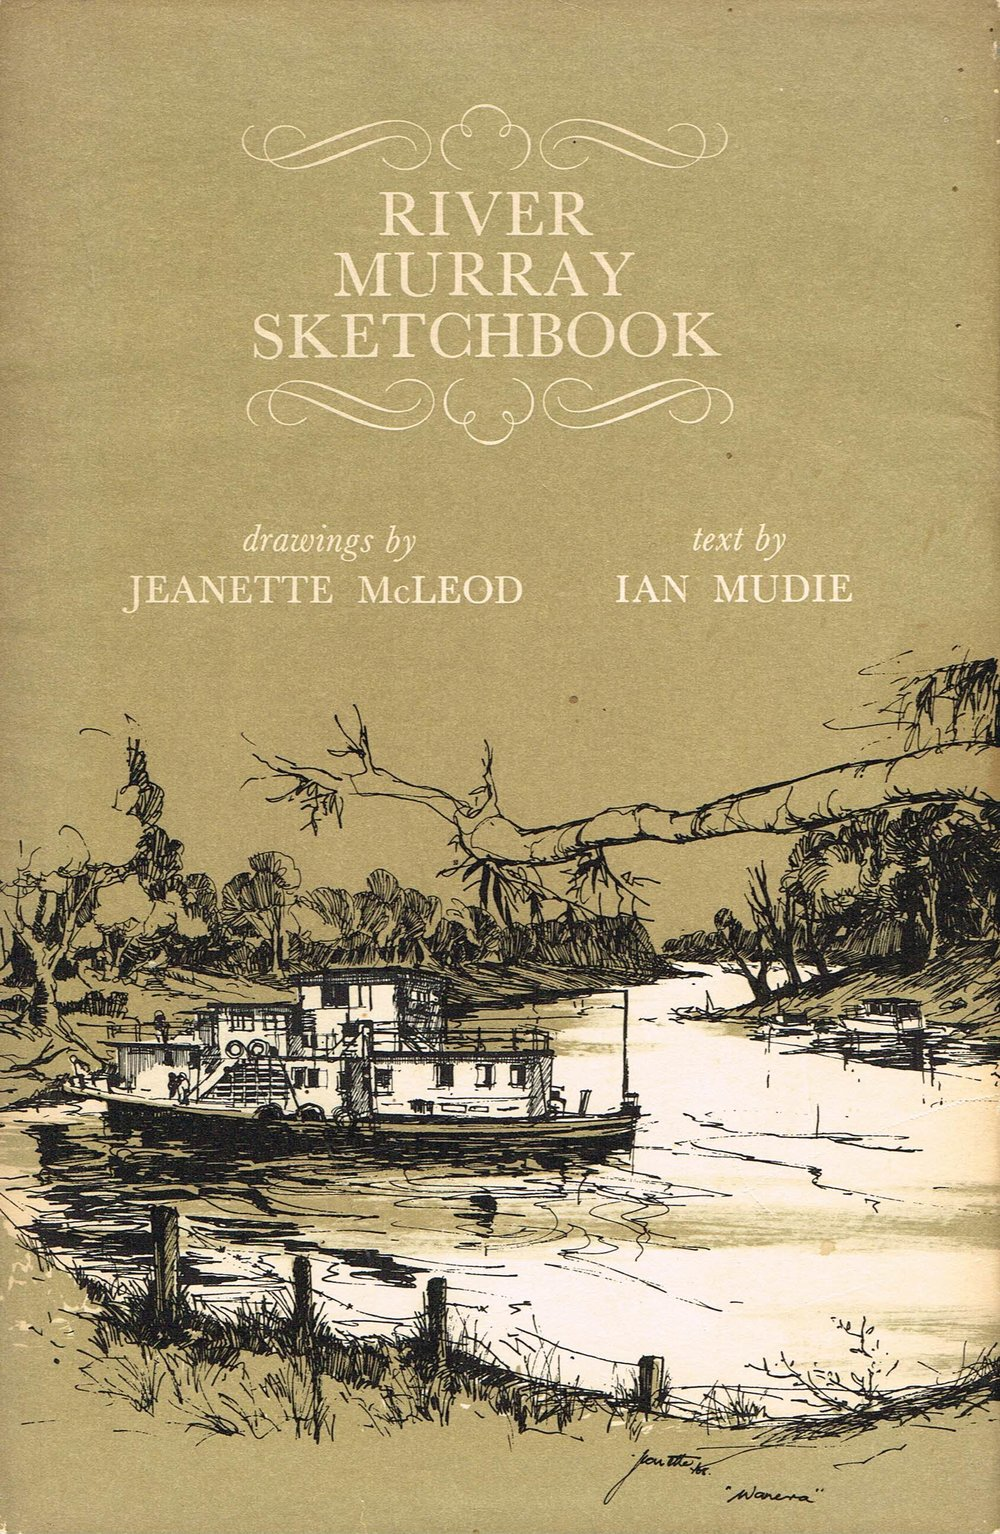 River Murray Sketchbook Drawings by Jeanette McLeod, text by Ian Mudie